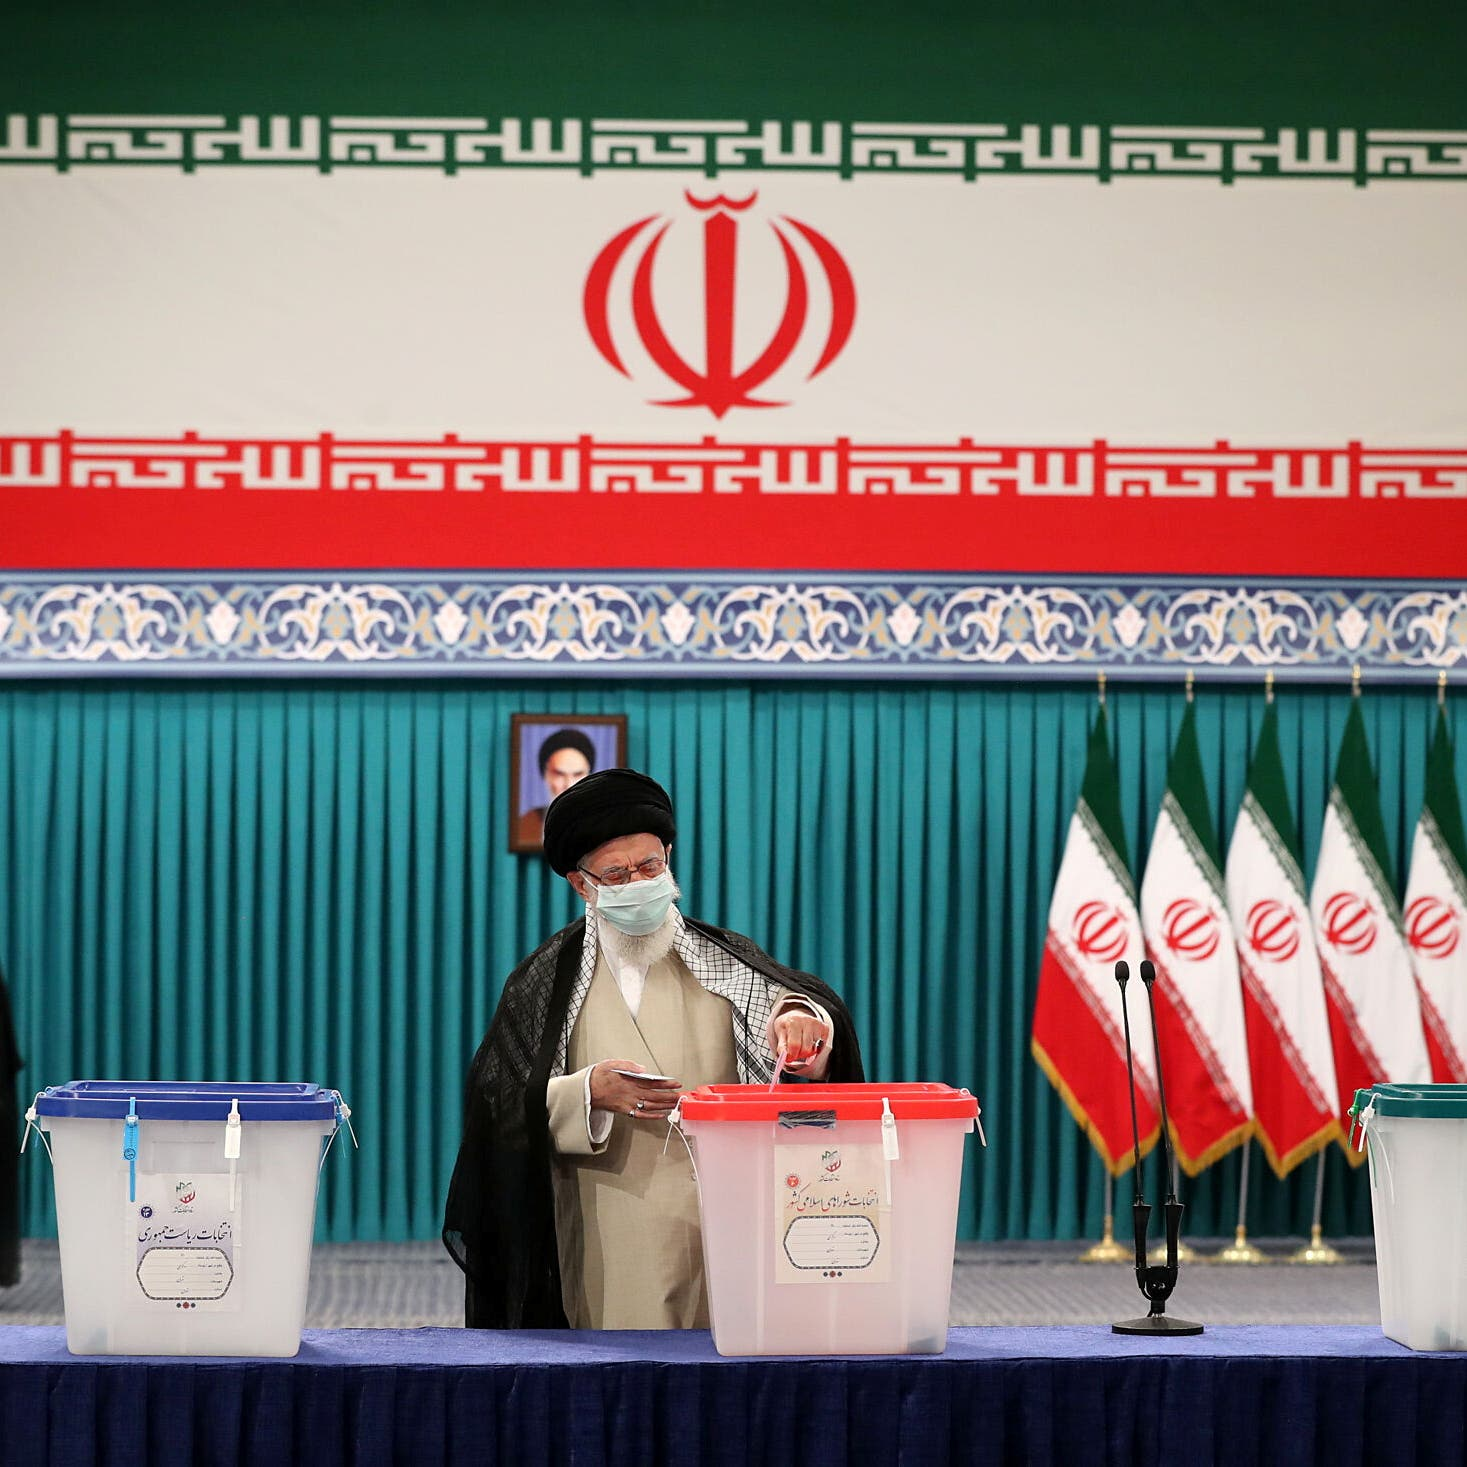 The Iranian regime and the fundamentalist era